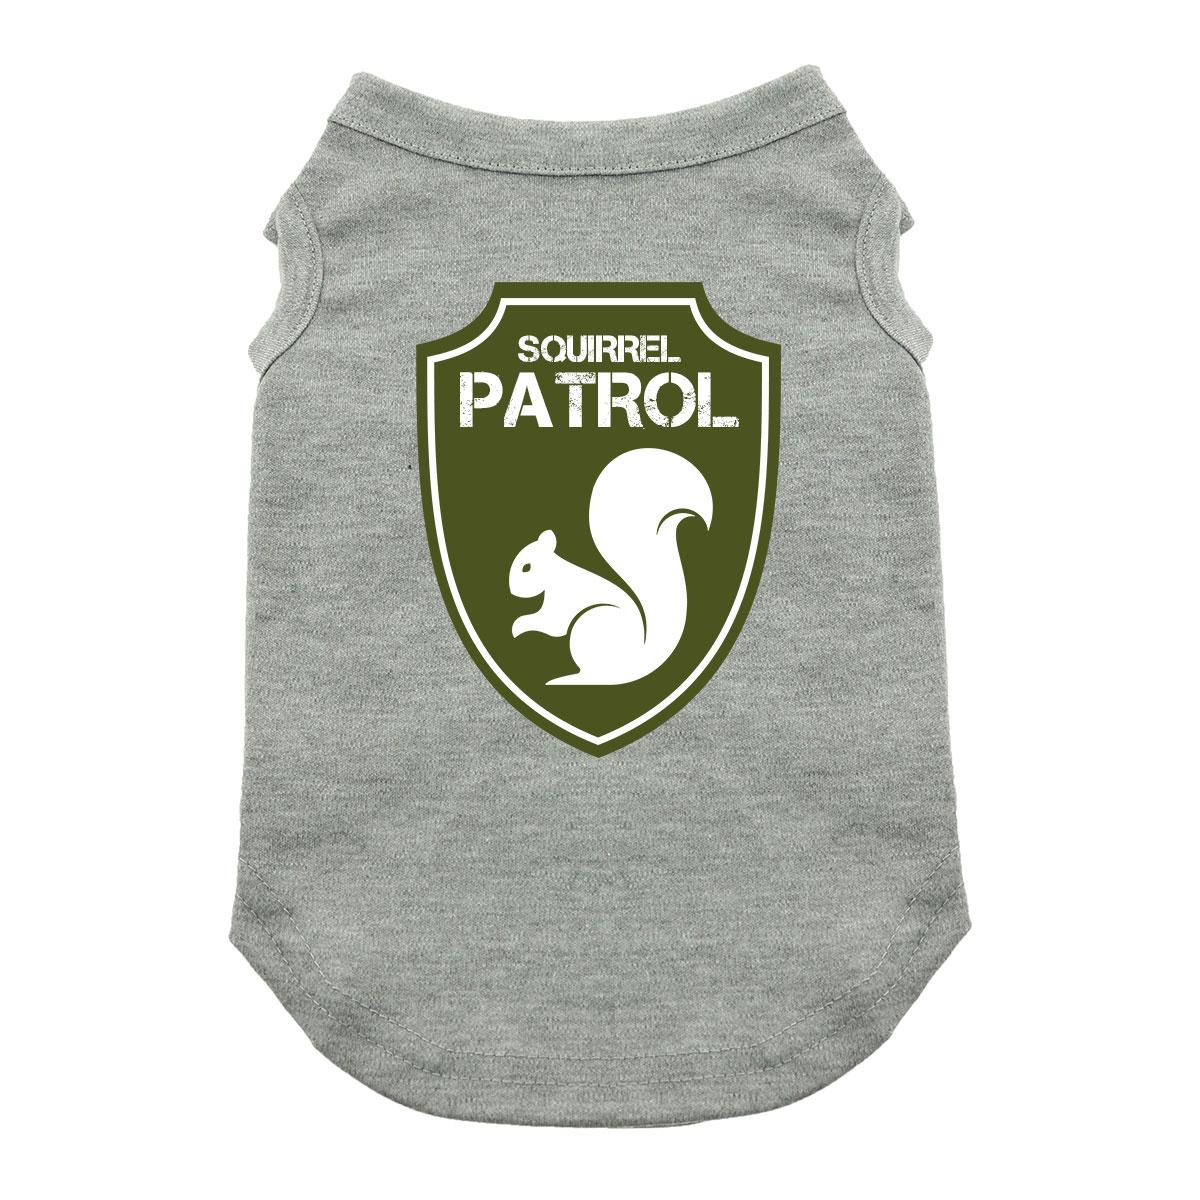 Squirrel Patrol Dog Shirt - Gray